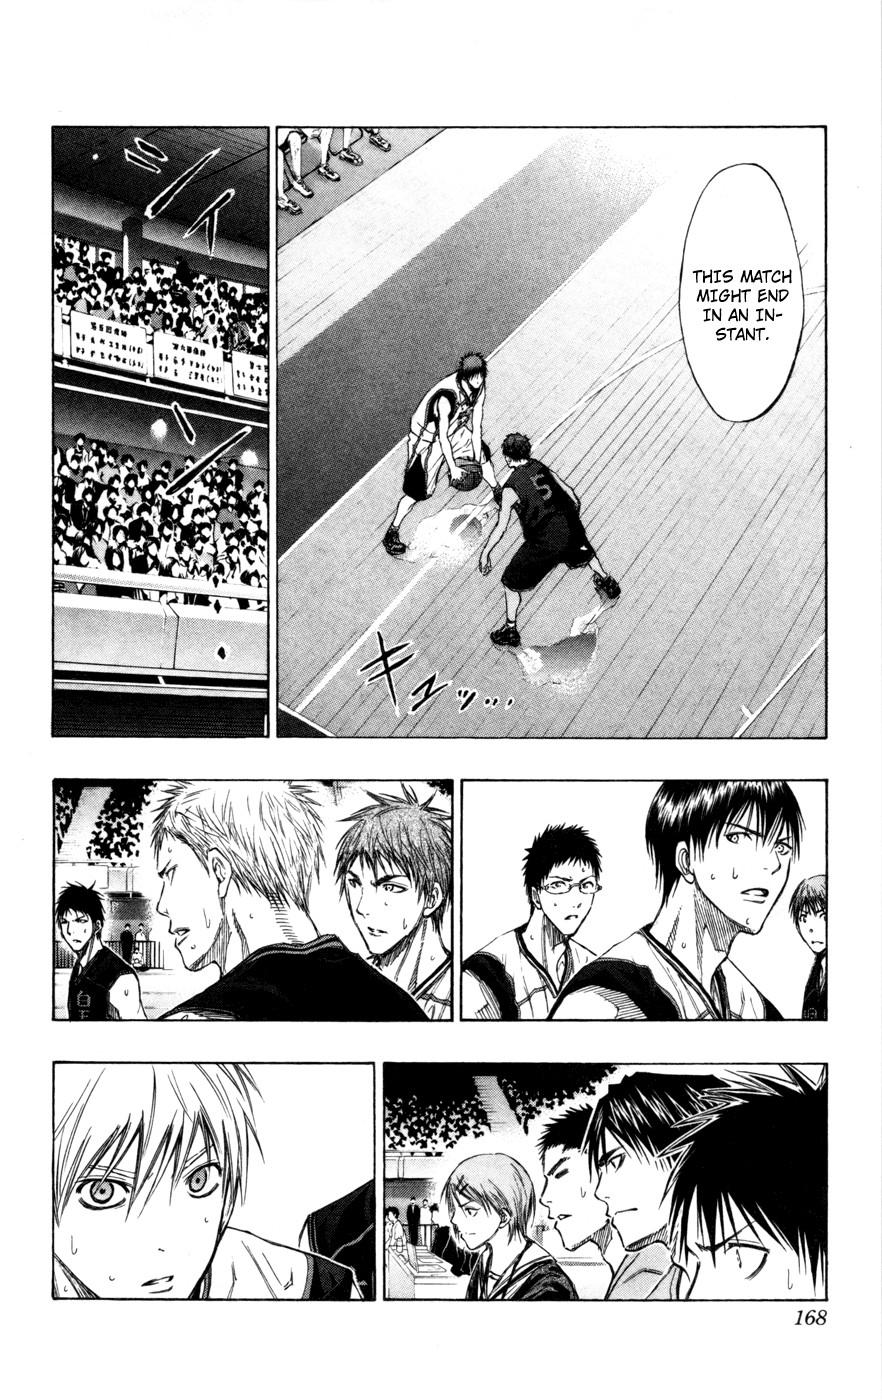 Kuroko no Basket Manga Chapter 117 - Image 3_168